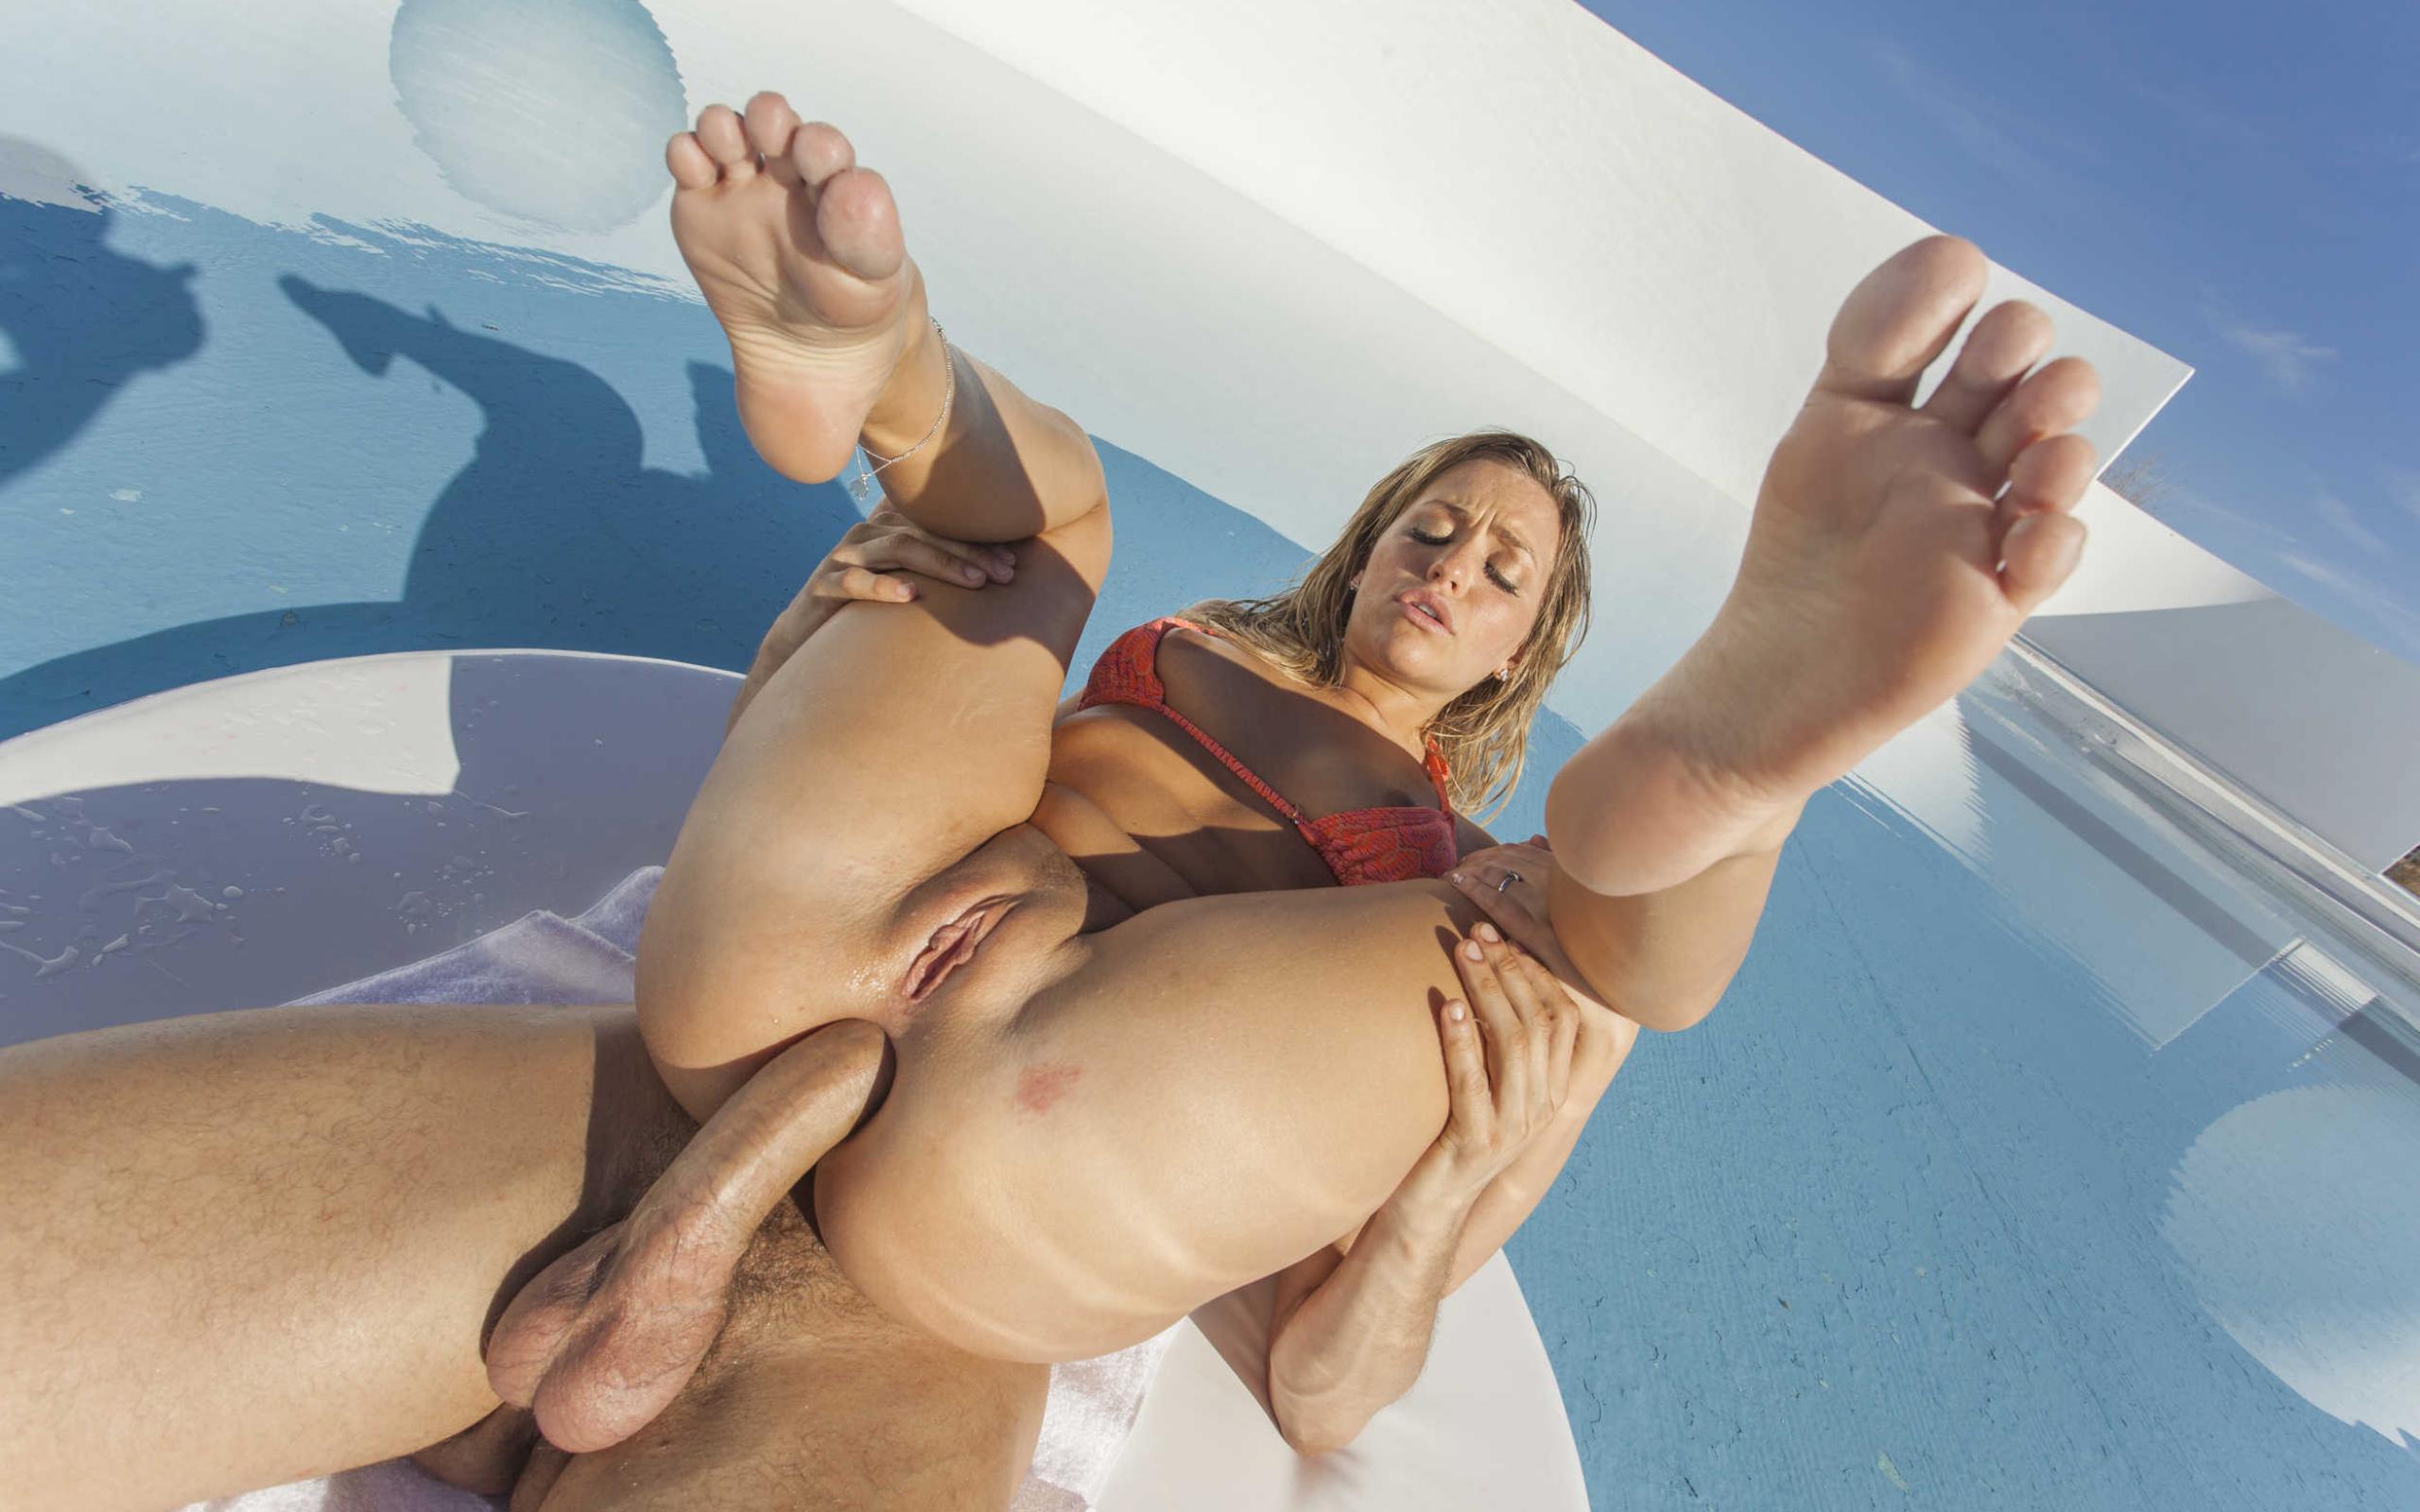 Pity, that Sexy greek girl footjob where